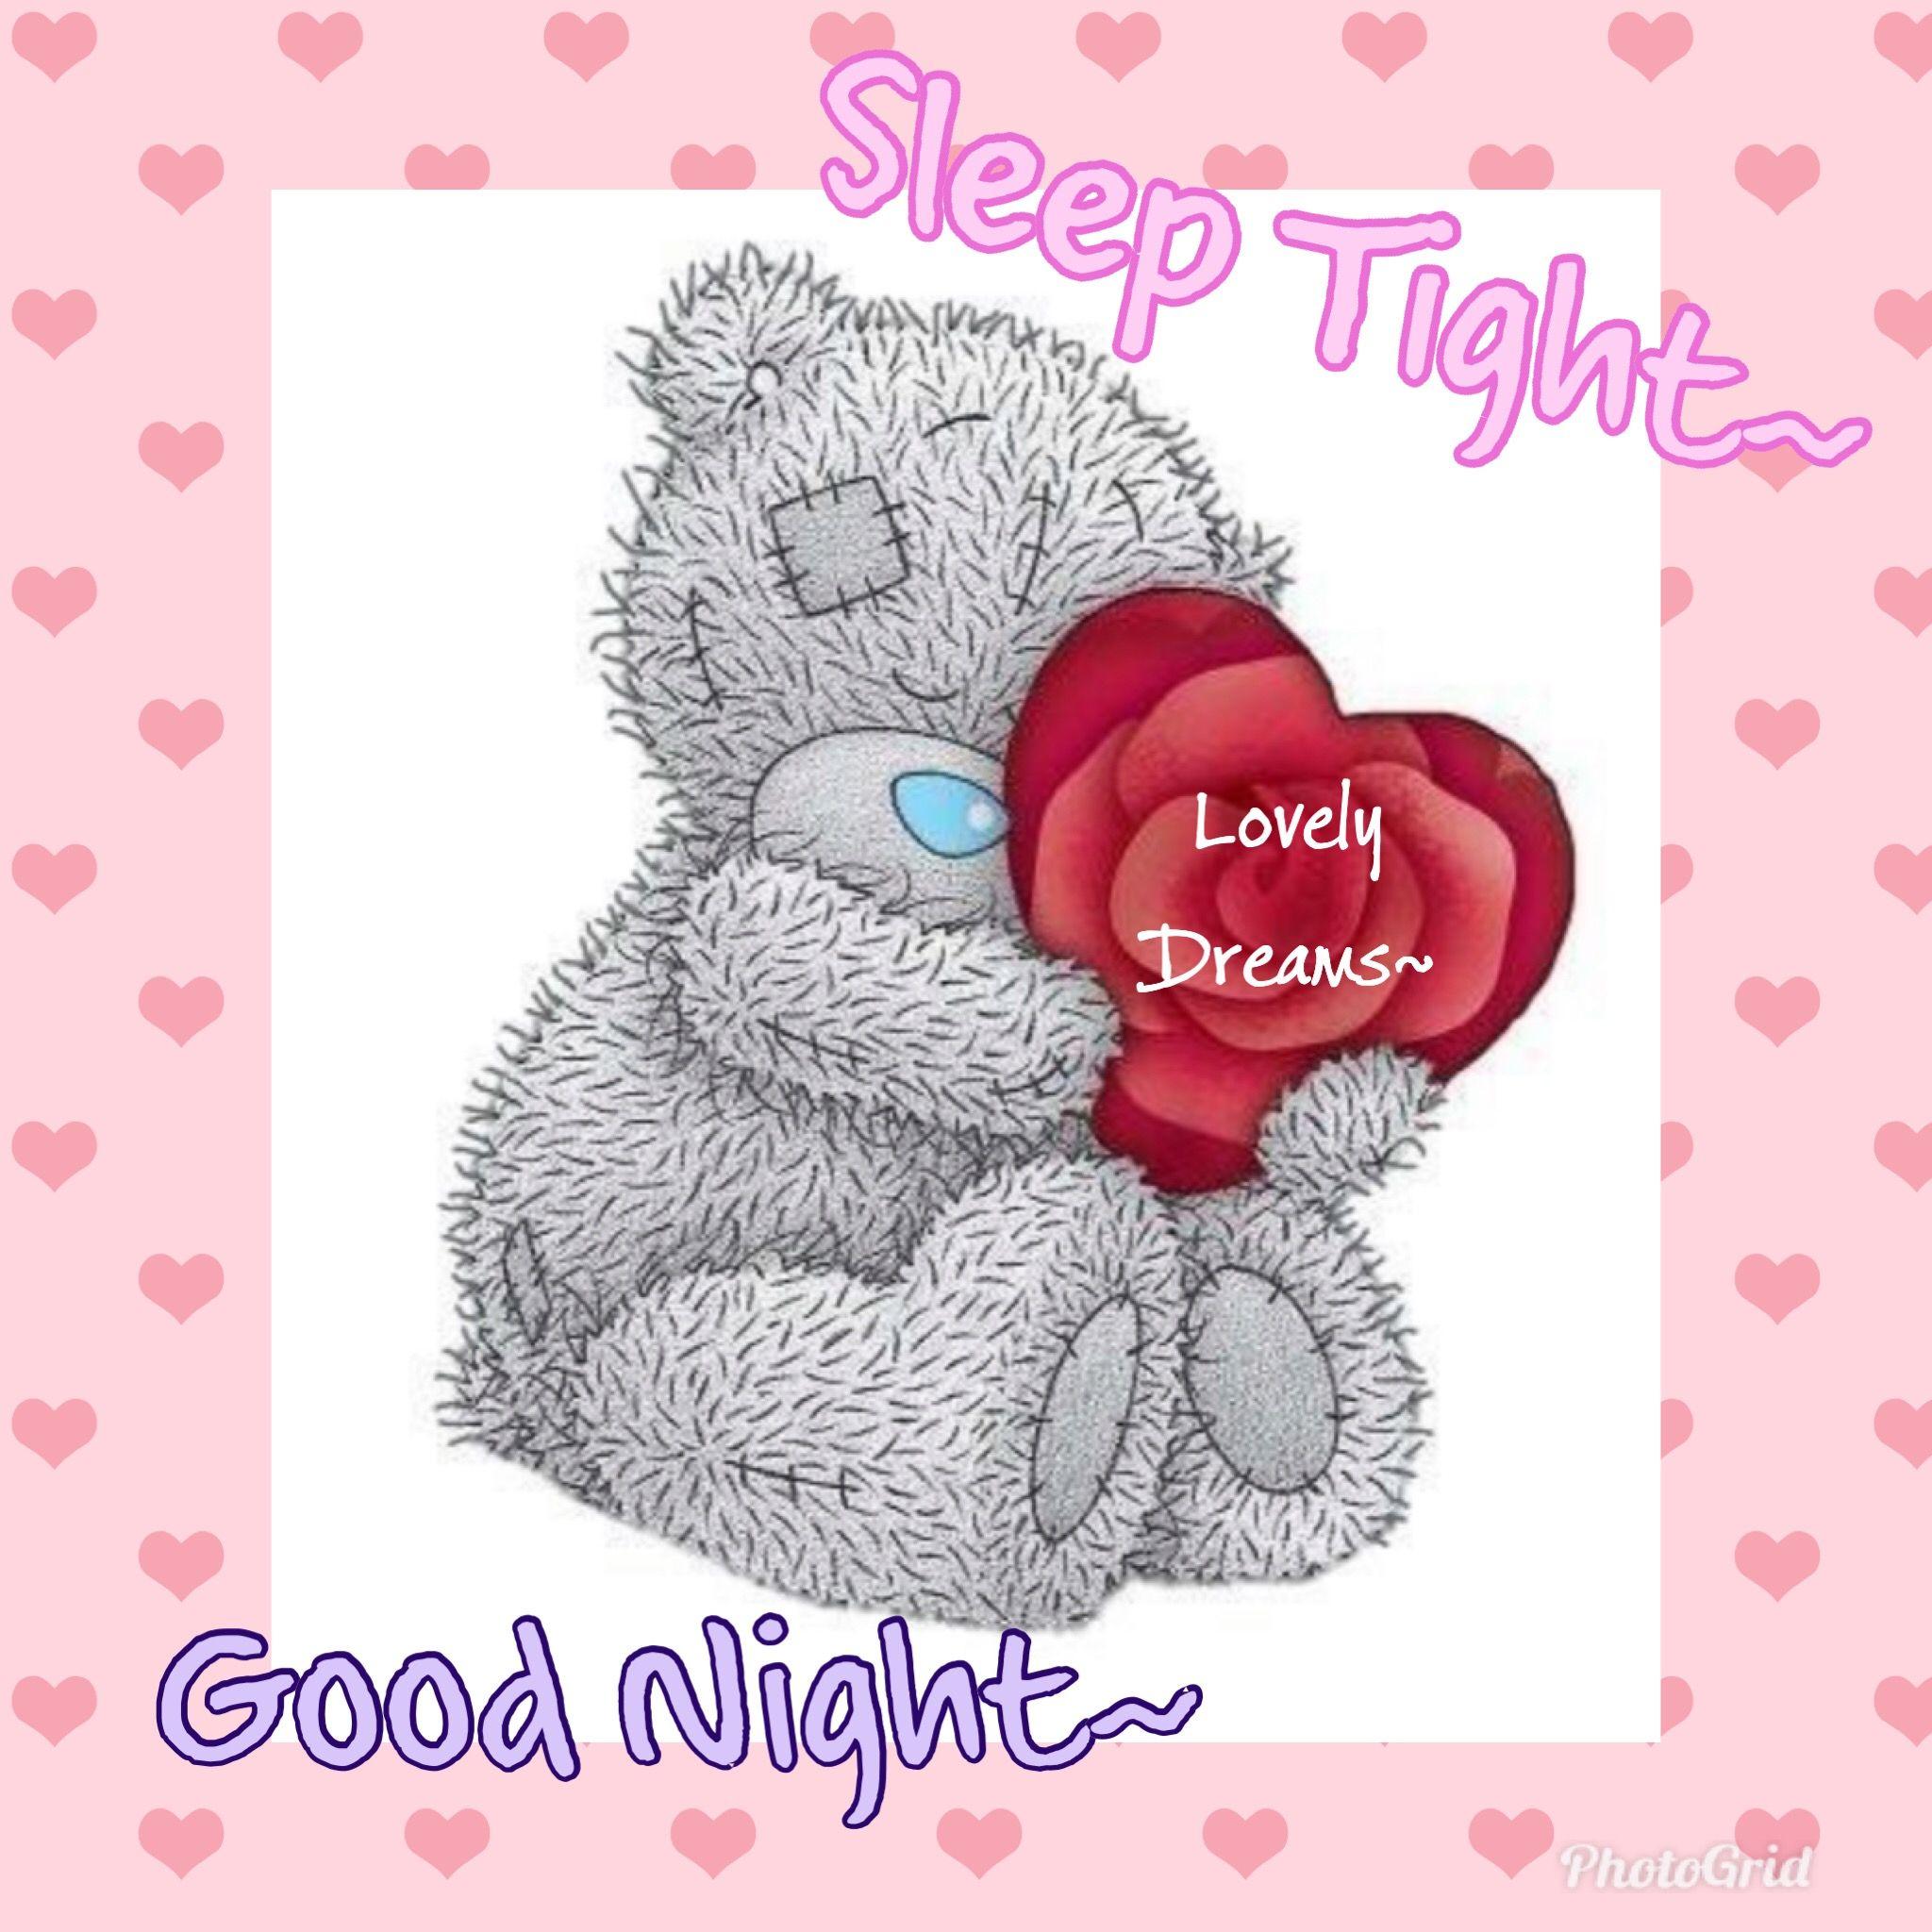 Good Night L Loe Good Night Greetings Good Night Sweet Dreams Sweet Dreams My Love